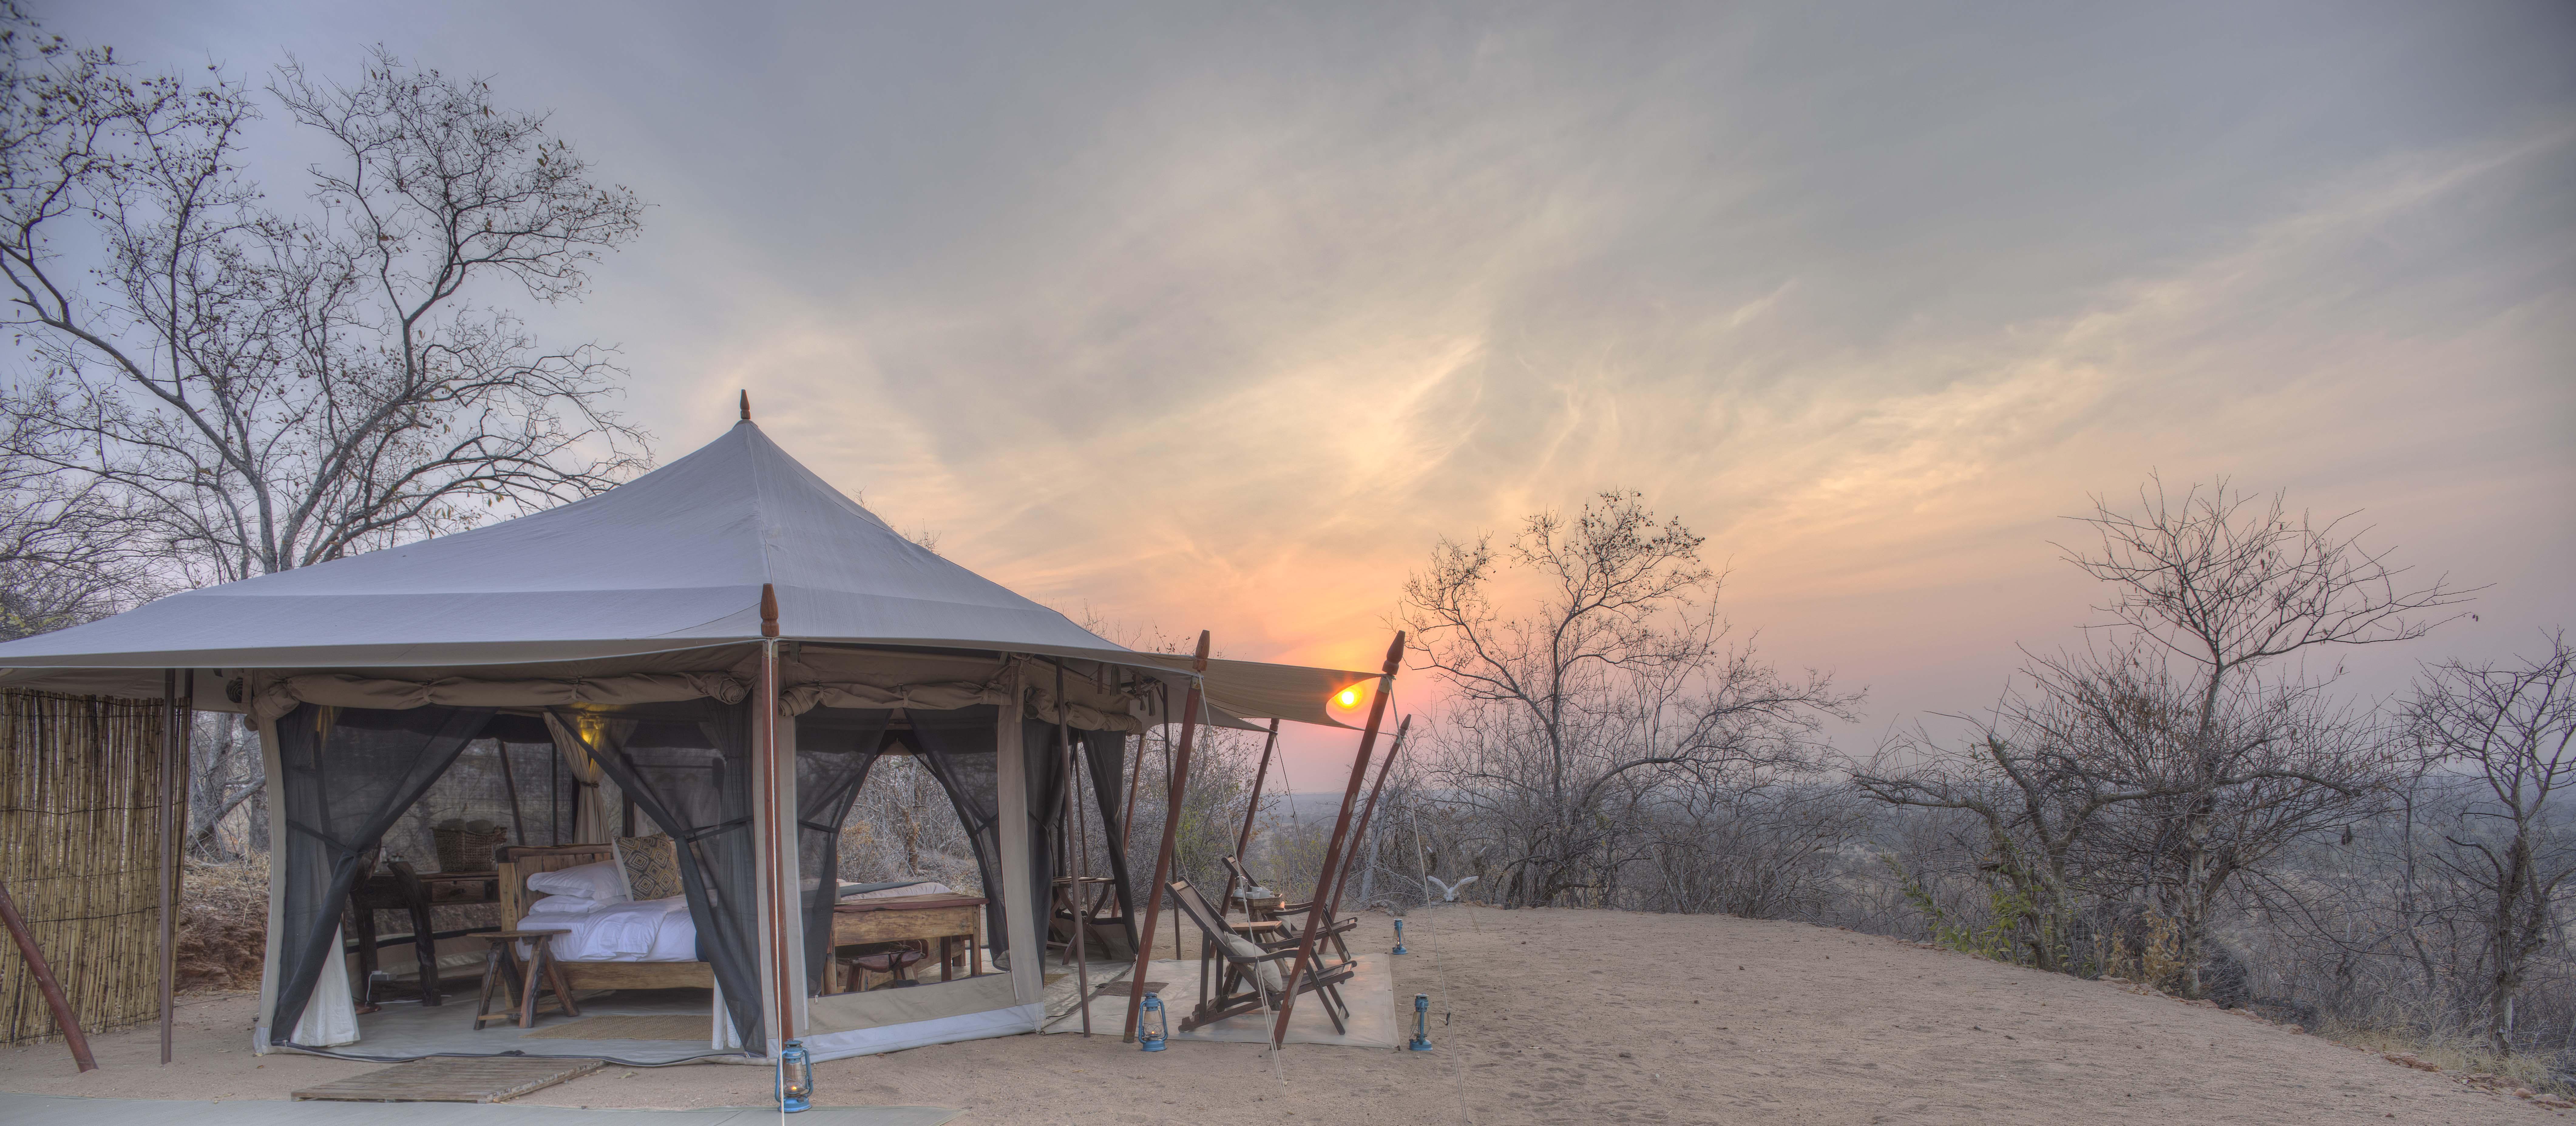 Kichaka Frontier Tent At Sunrise